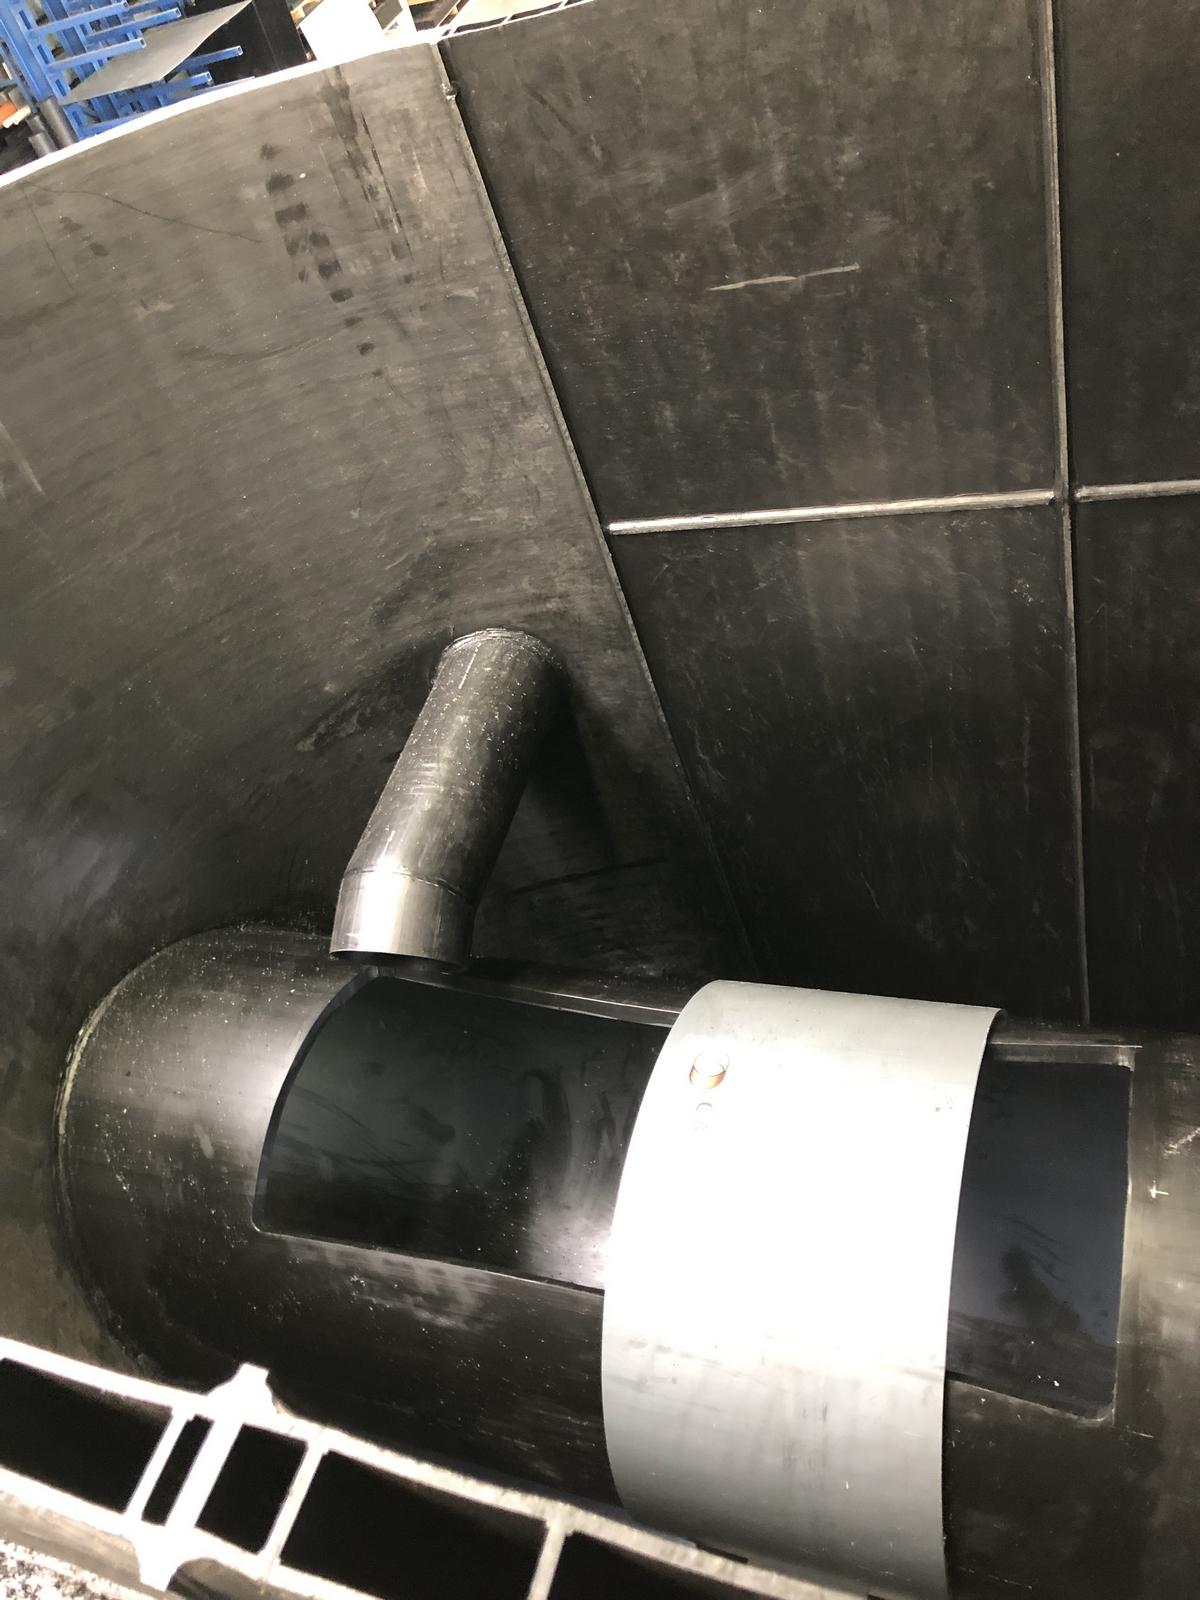 Déversoir HDPE 1200 09